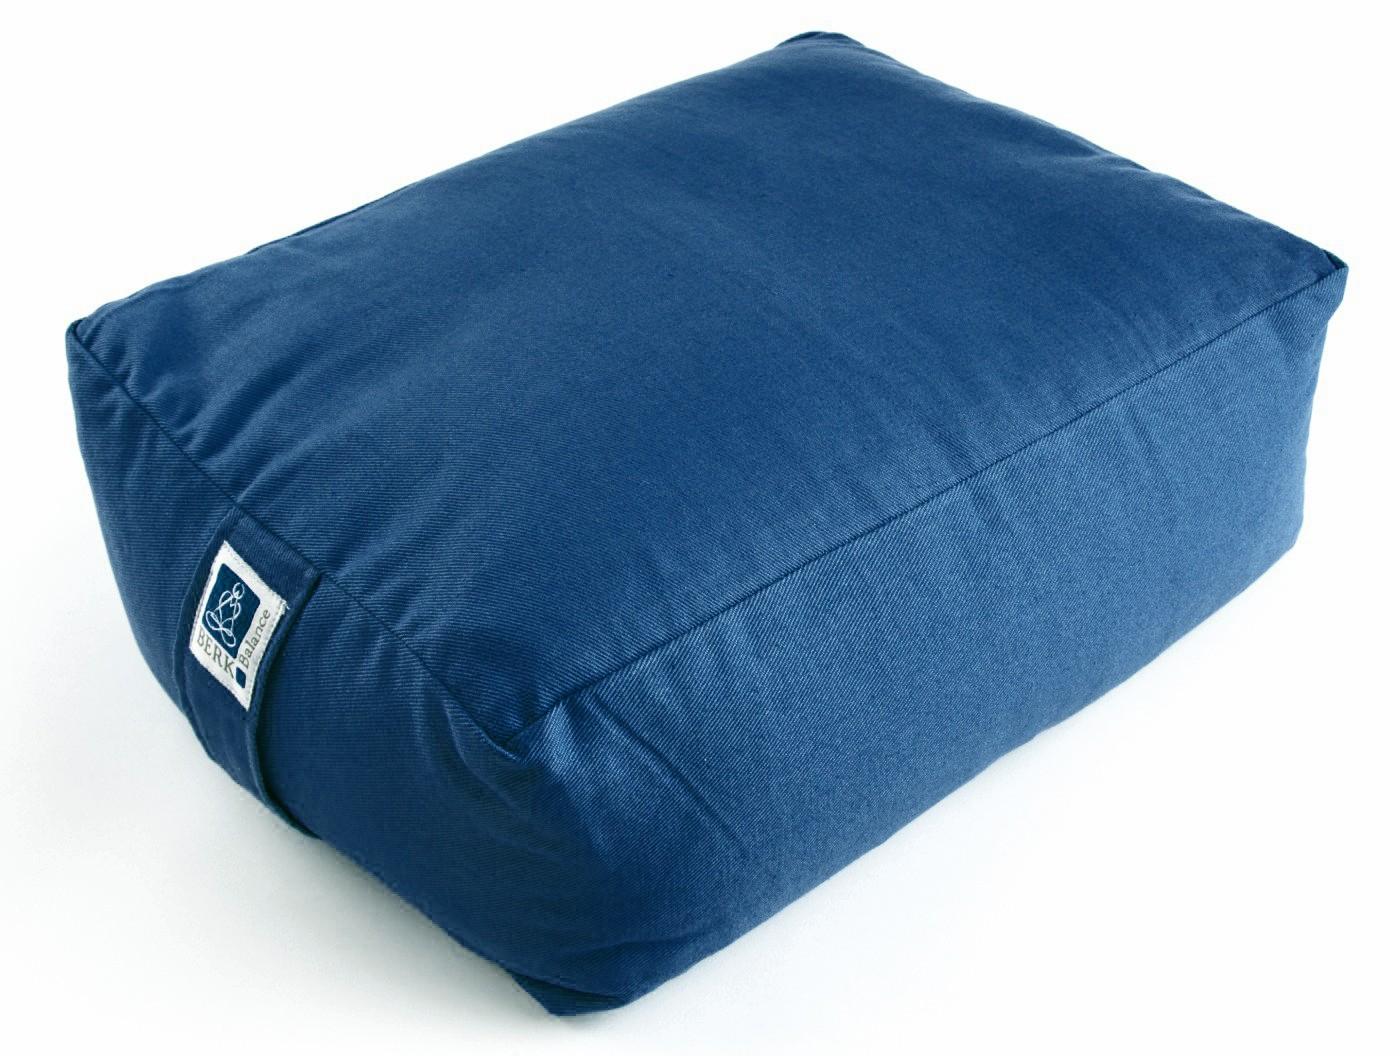 yogakissen meditationskissen quader 40 x 30 x 15 cm bezug baumwolle blau abnehmbar f llung. Black Bedroom Furniture Sets. Home Design Ideas